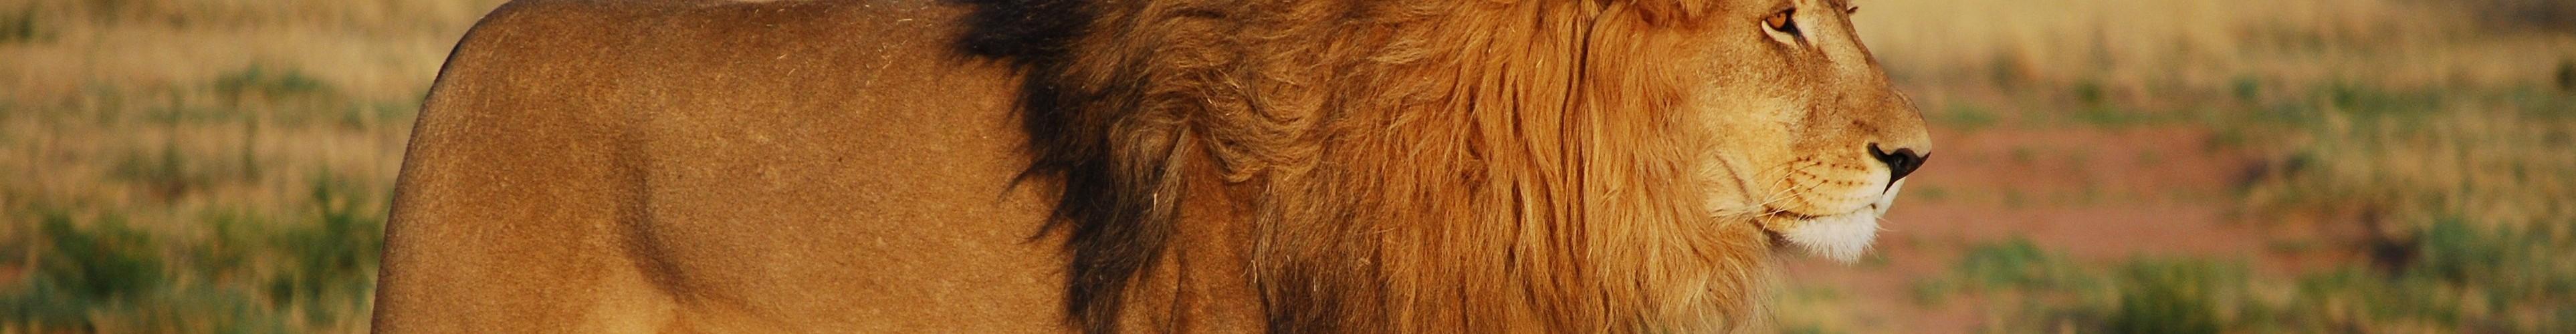 mb Löwe Selbstbewusstsein